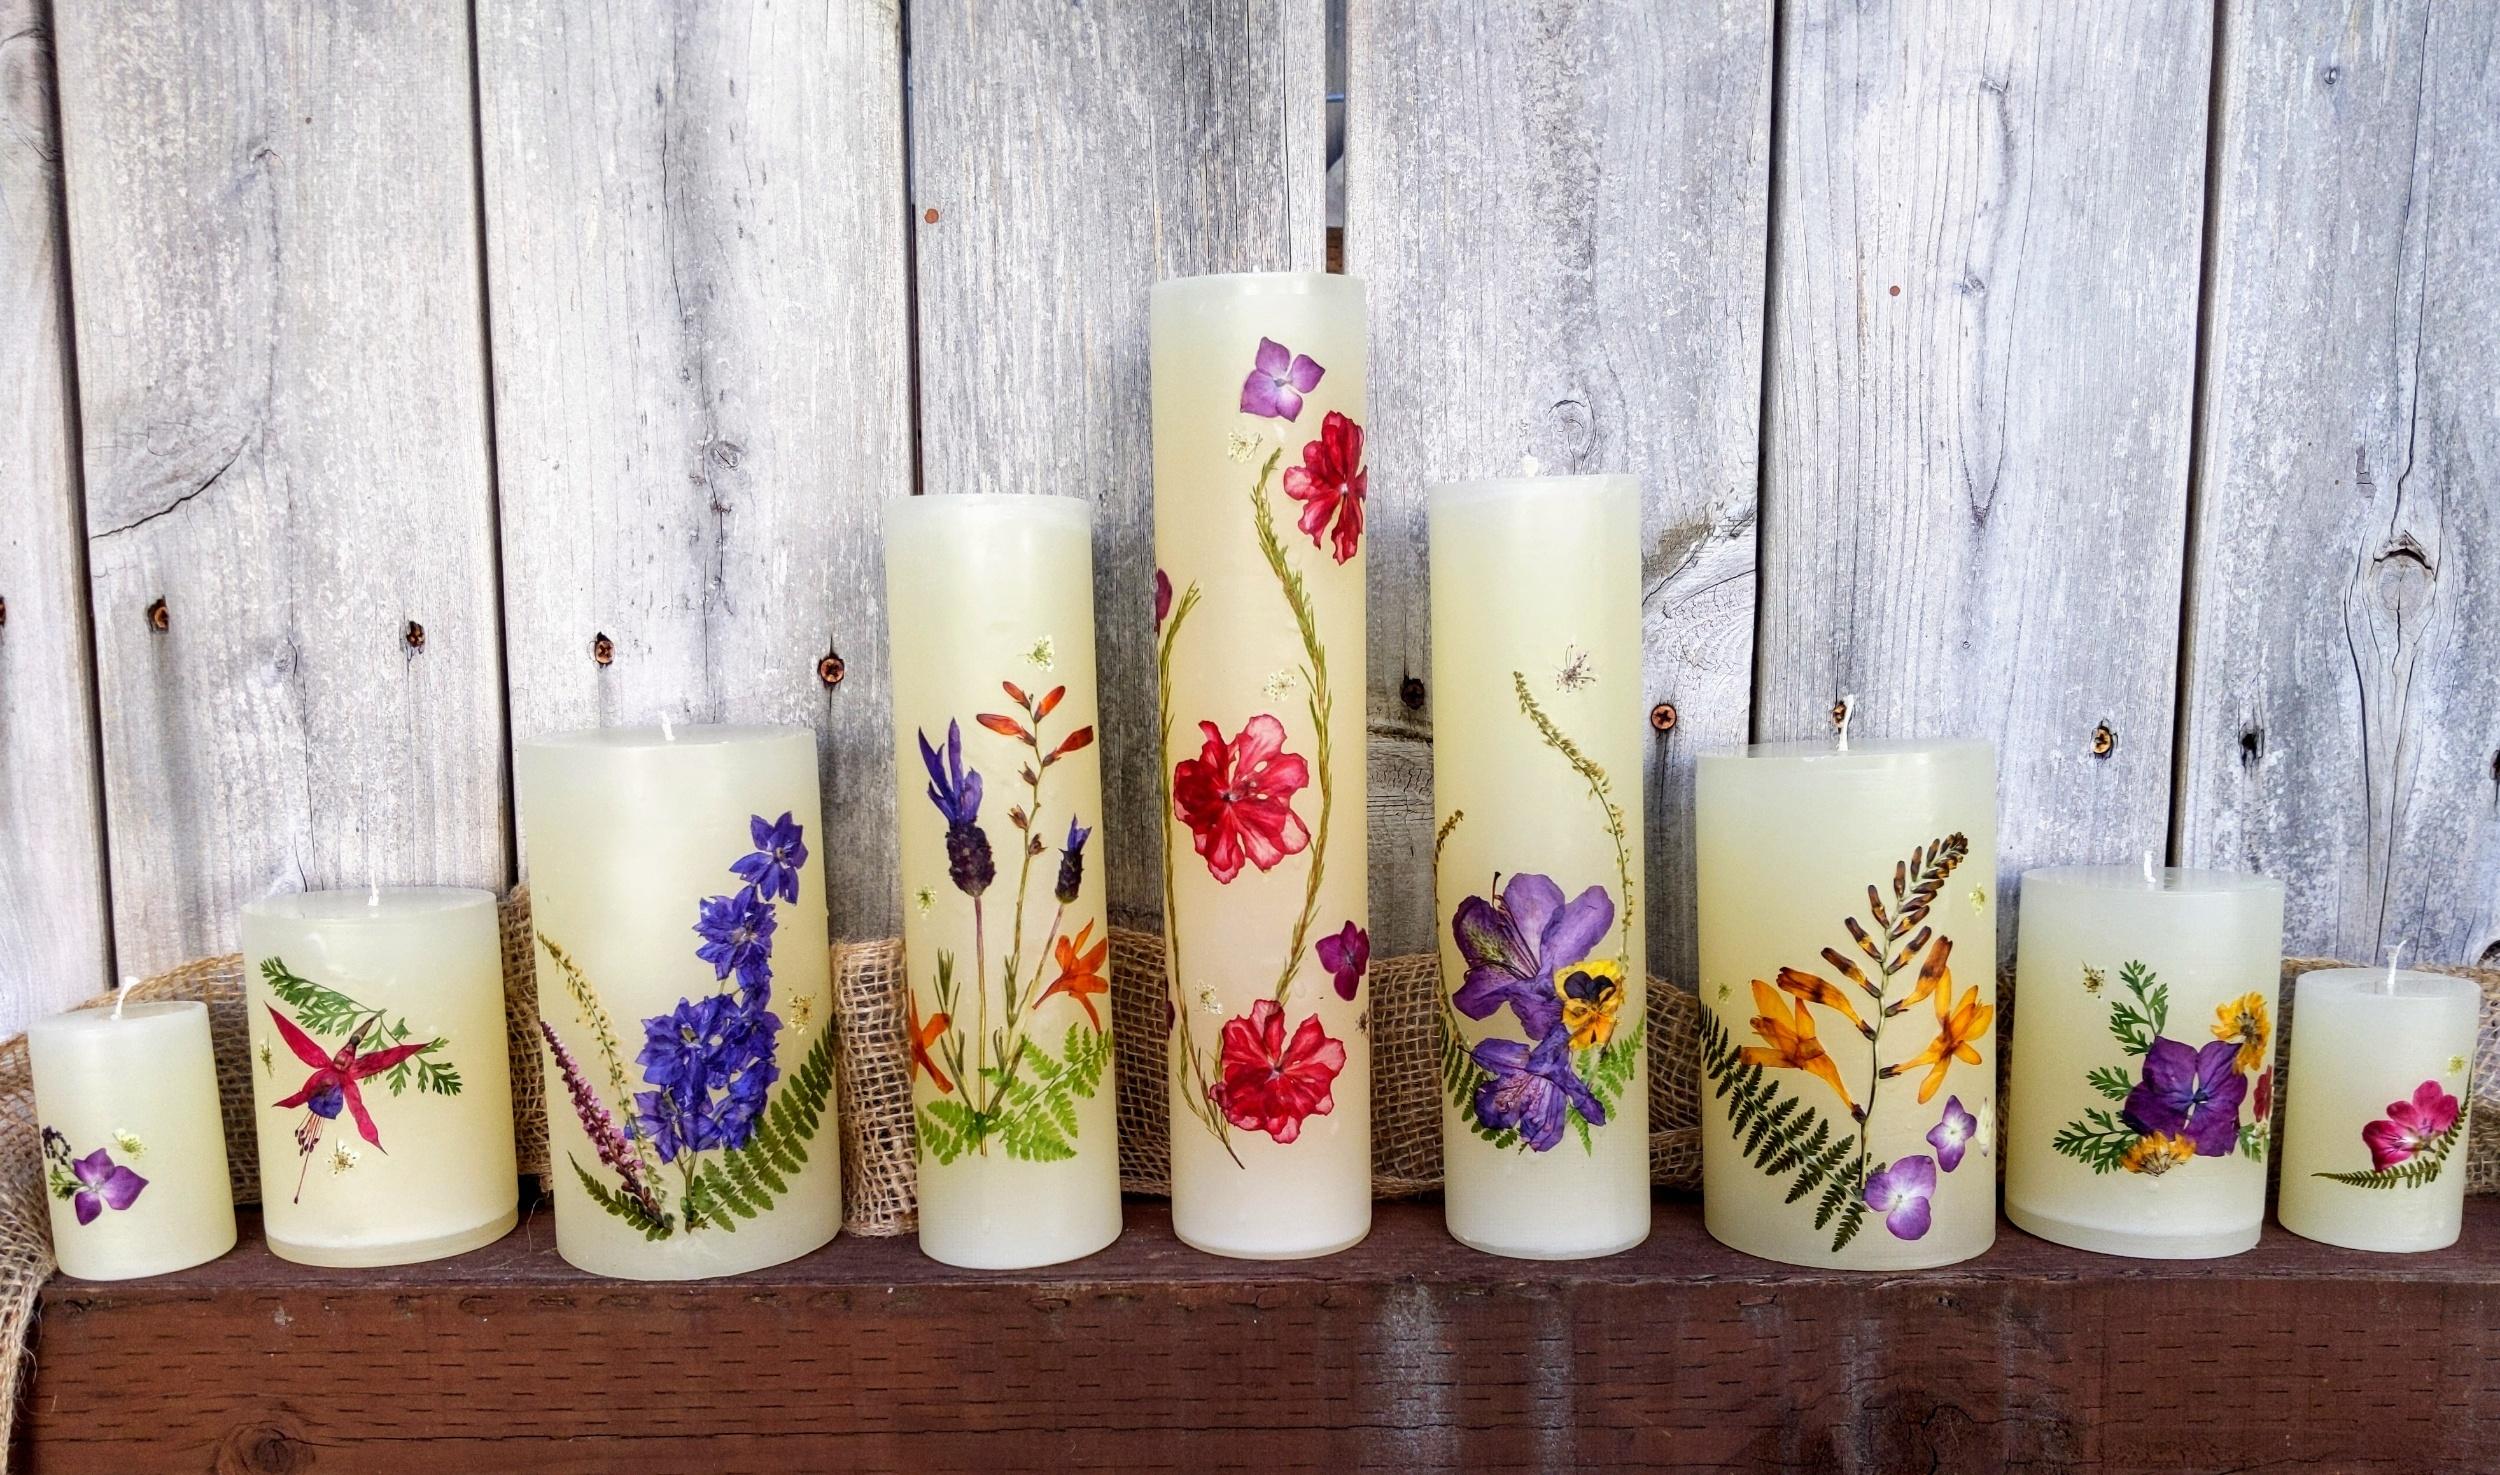 Beautiful flowers inspire new beautiful designs.